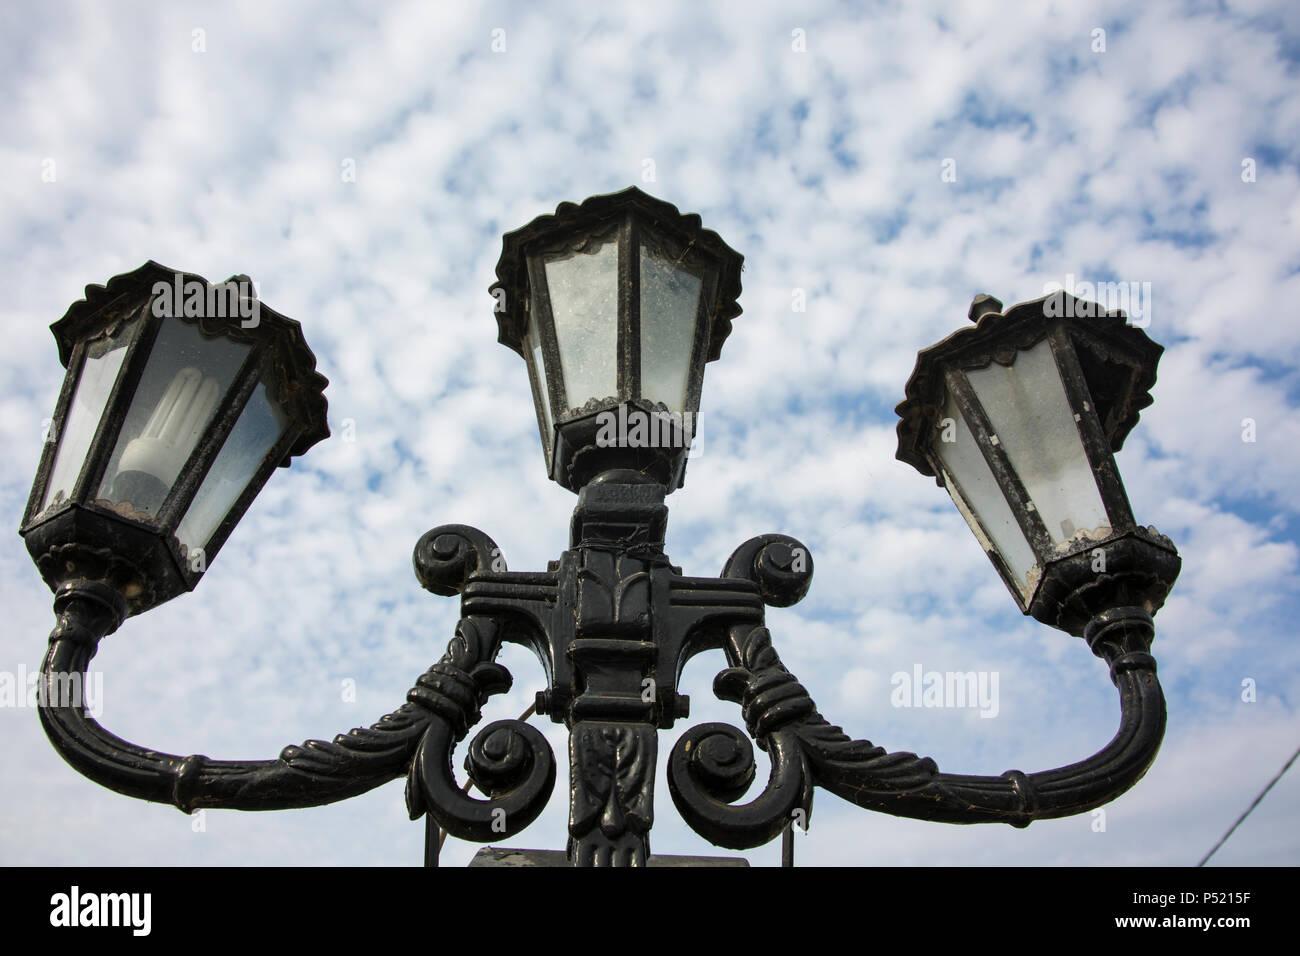 Lamp post in Lefkimmi, Greece - Stock Image